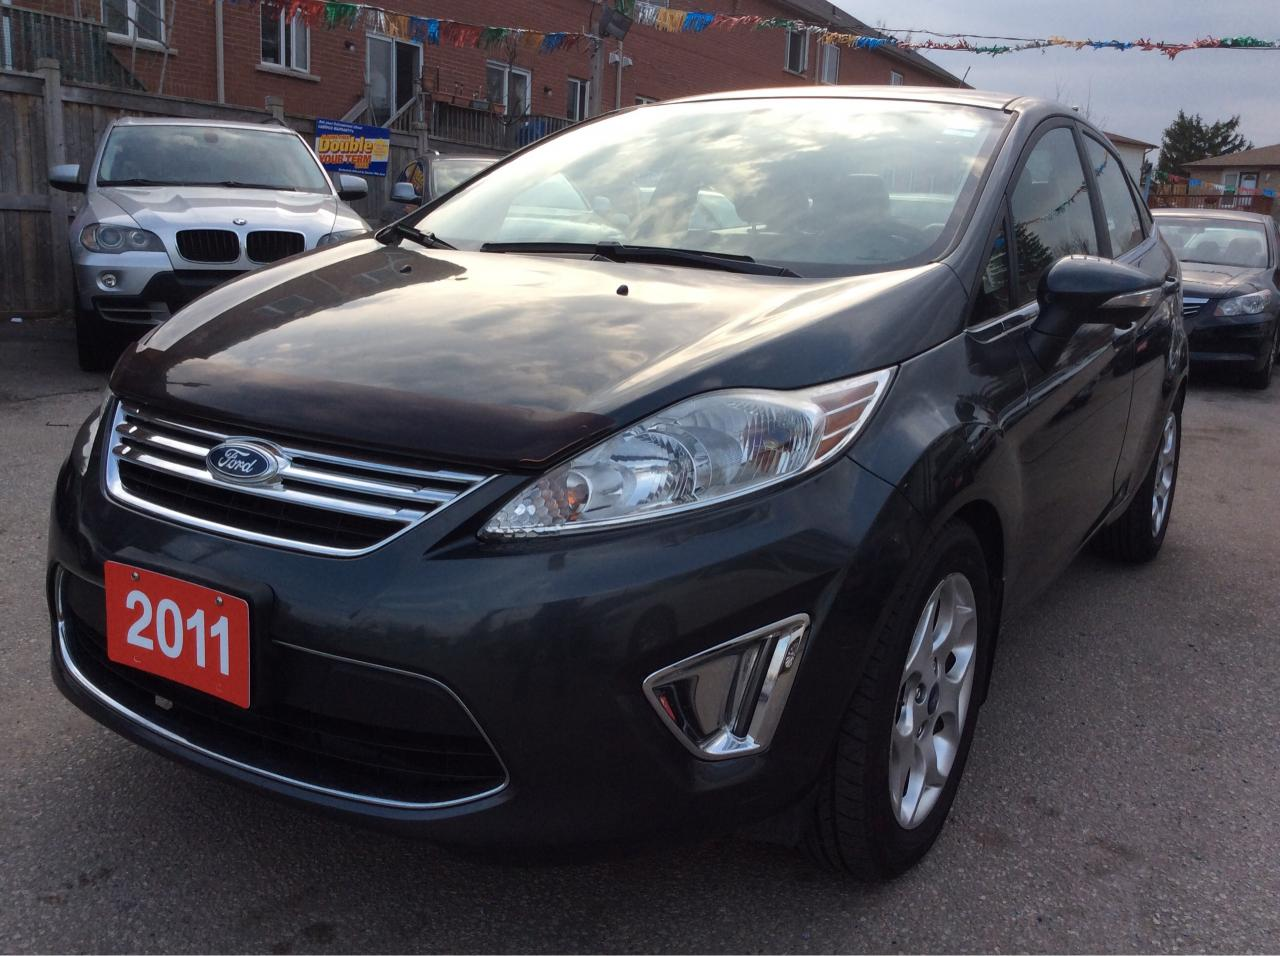 2011 Ford Fiesta SEL/Push-Start/Bluetooth/Leather/Sunroof/Alloys